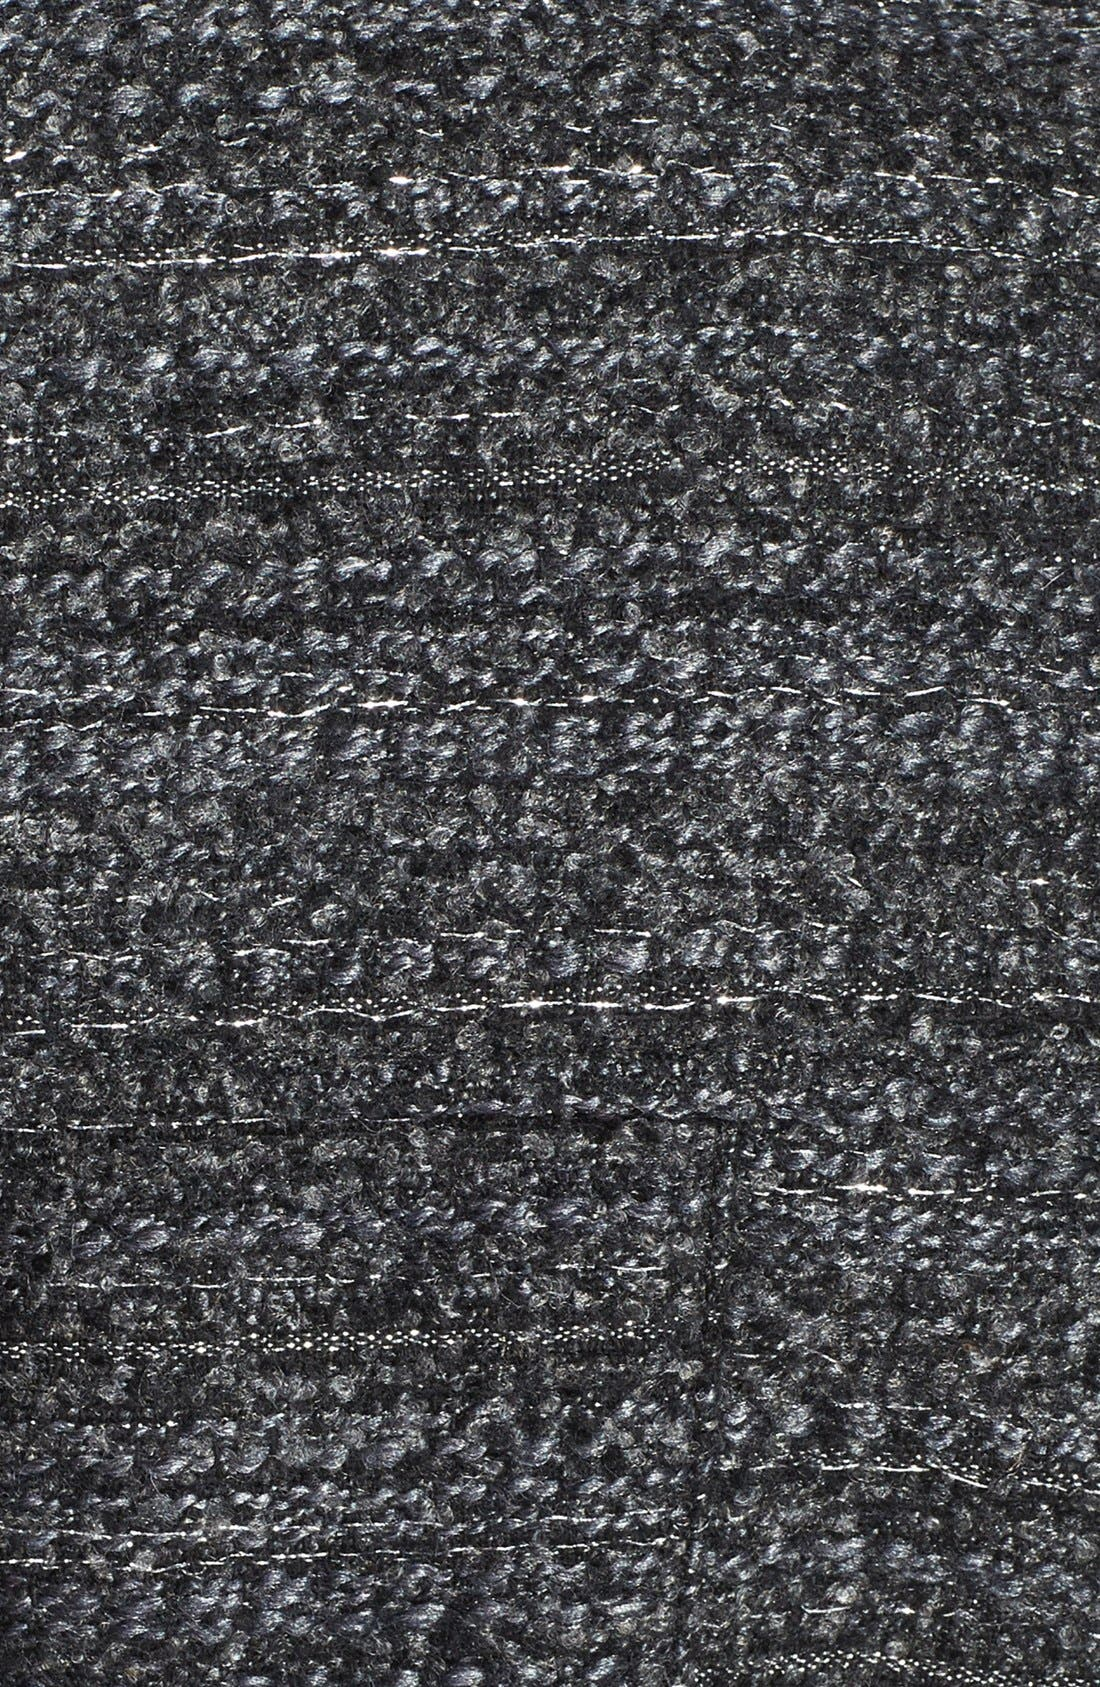 Metallic Tweed Walking Coat,                             Alternate thumbnail 3, color,                             Black